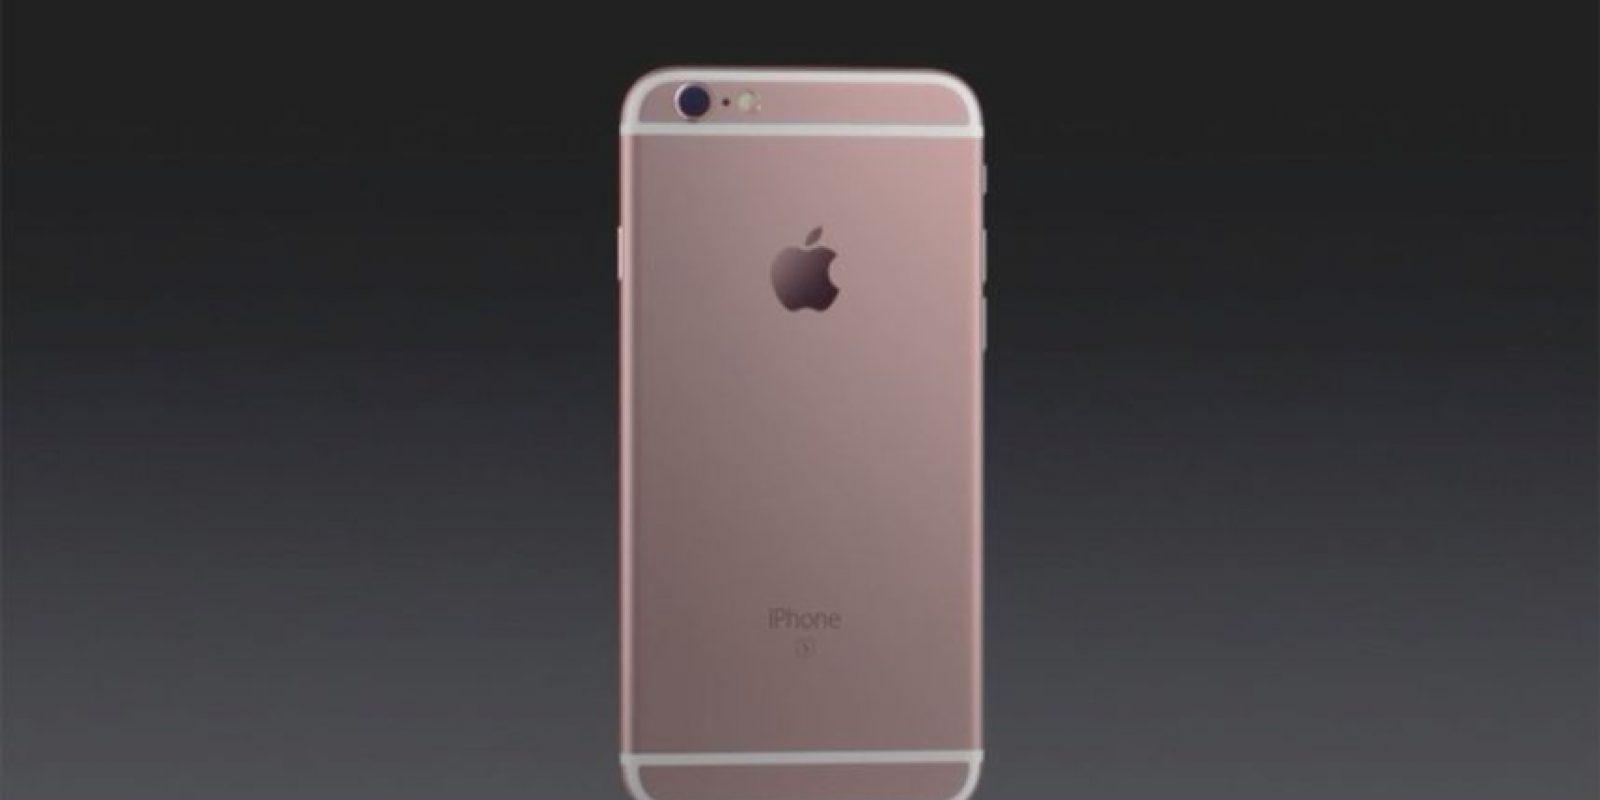 La cámara posterior es de 12 megapíxeles. Foto:Apple